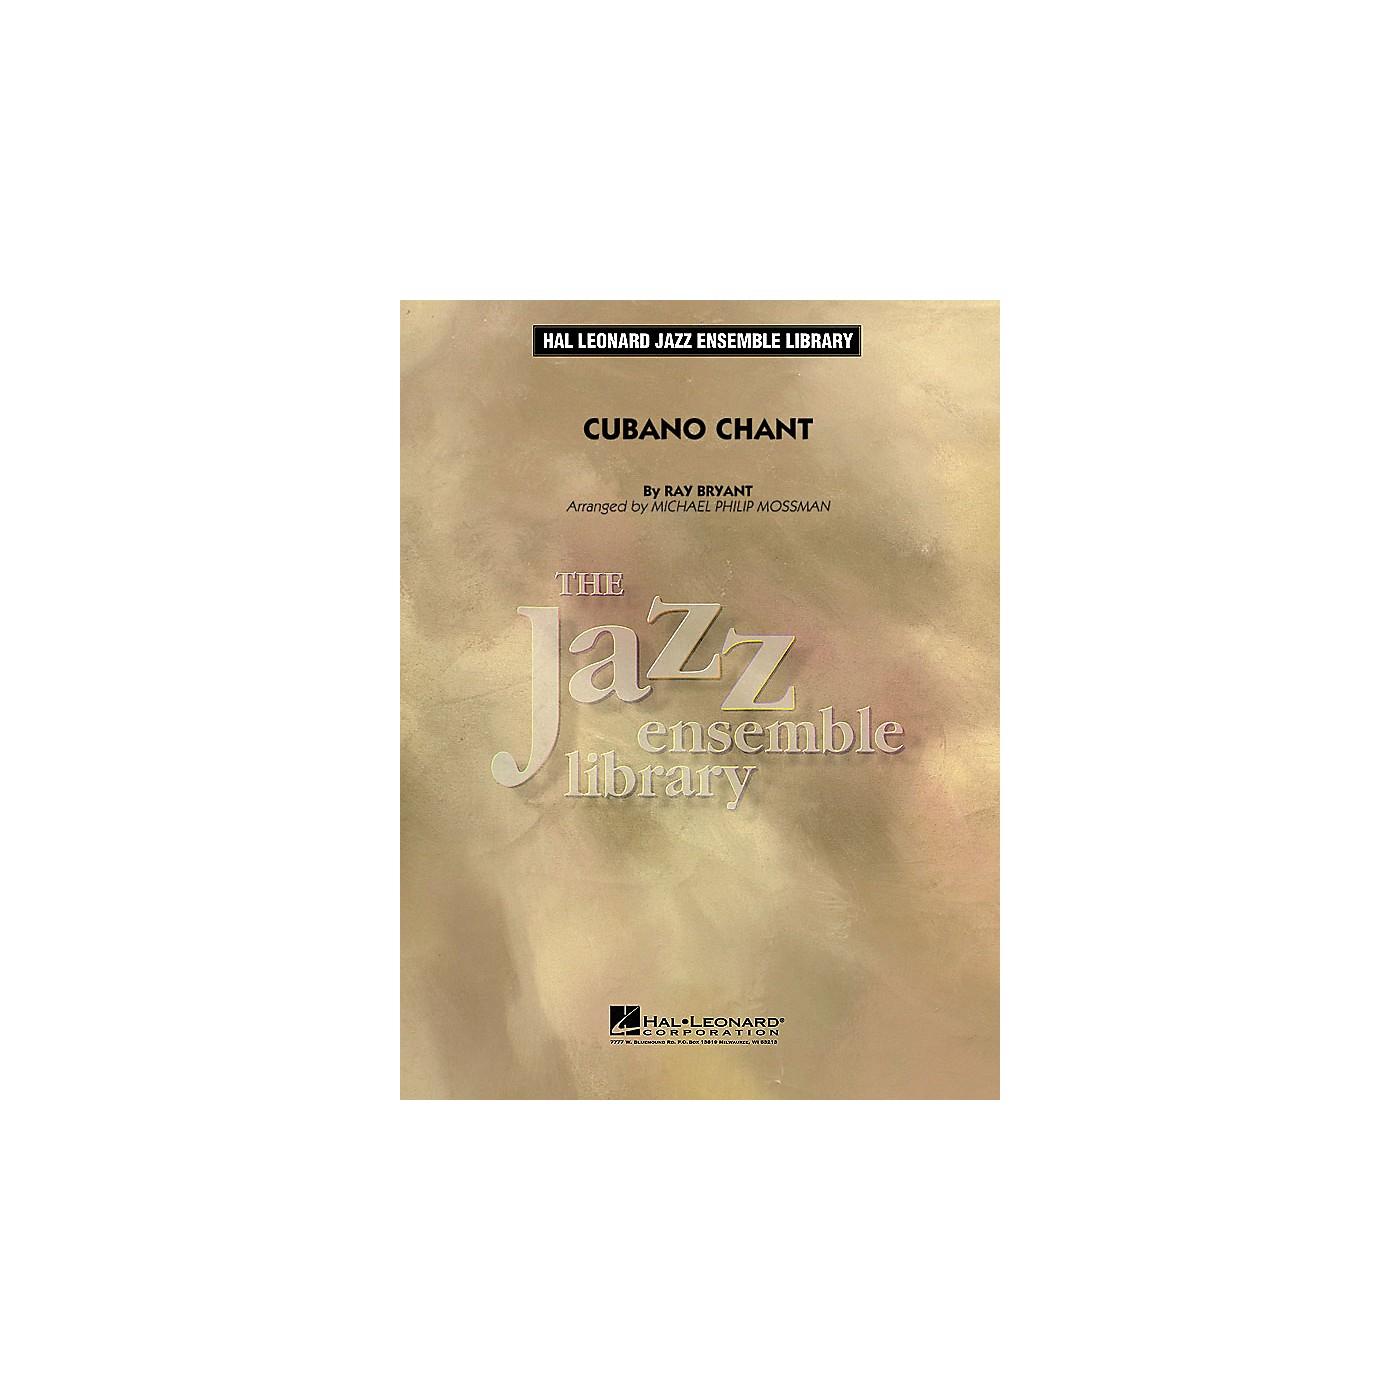 Hal Leonard Cubano Chant Jazz Band Level 4 Arranged by Michael Philip Mossman thumbnail